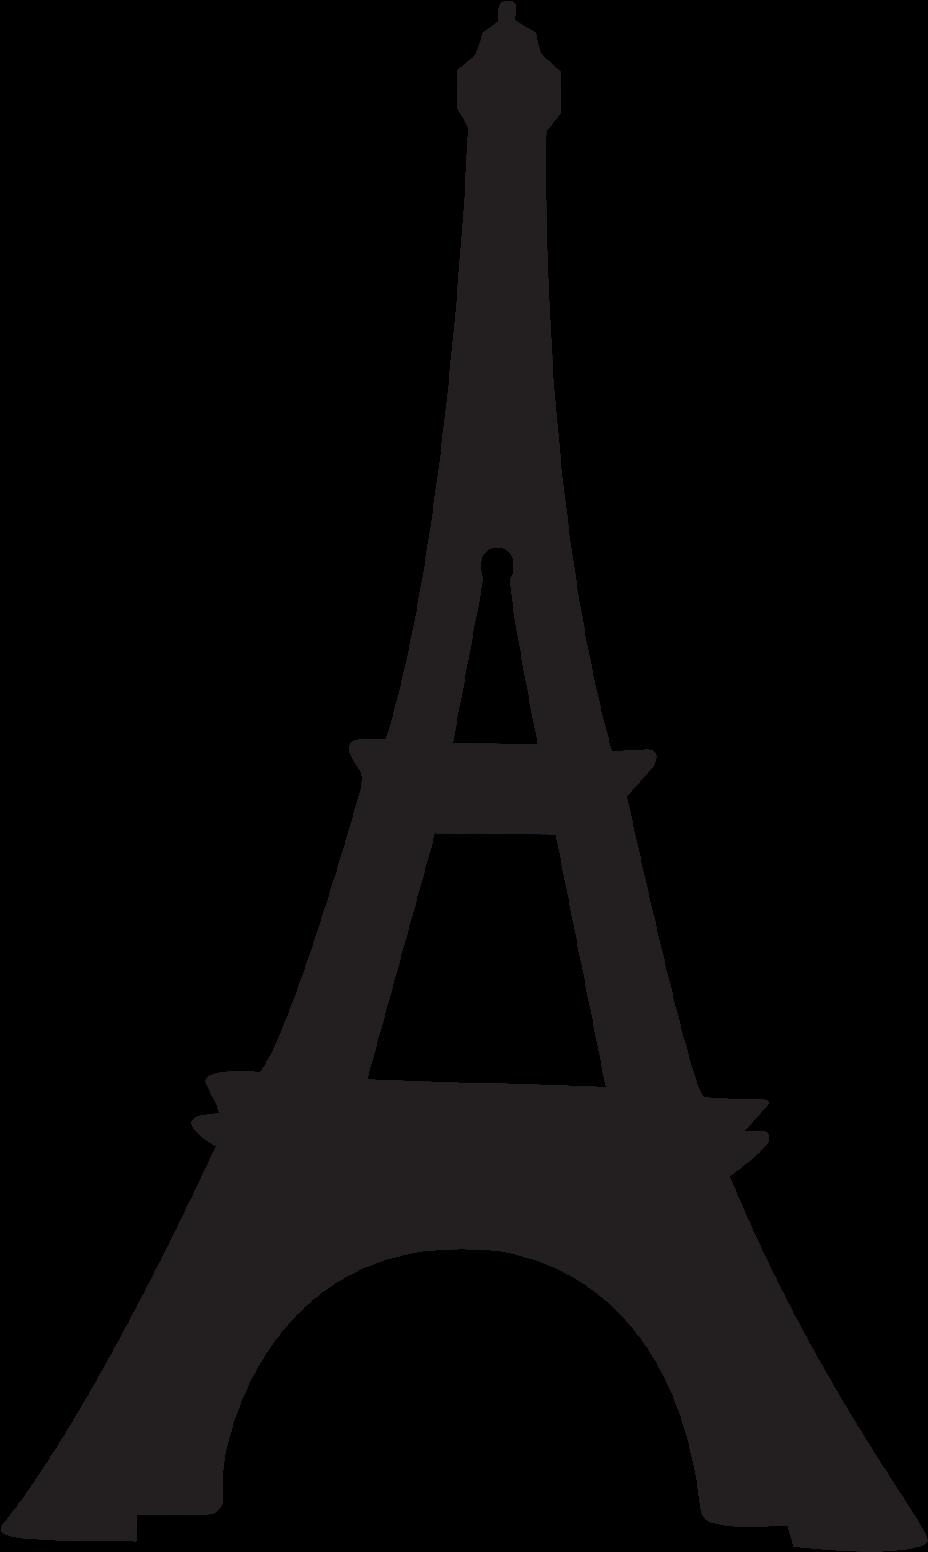 Sexy Paris Clipart Torres De Paris Dibujos Png Download Full Size Clipart 841283 Pinclipart